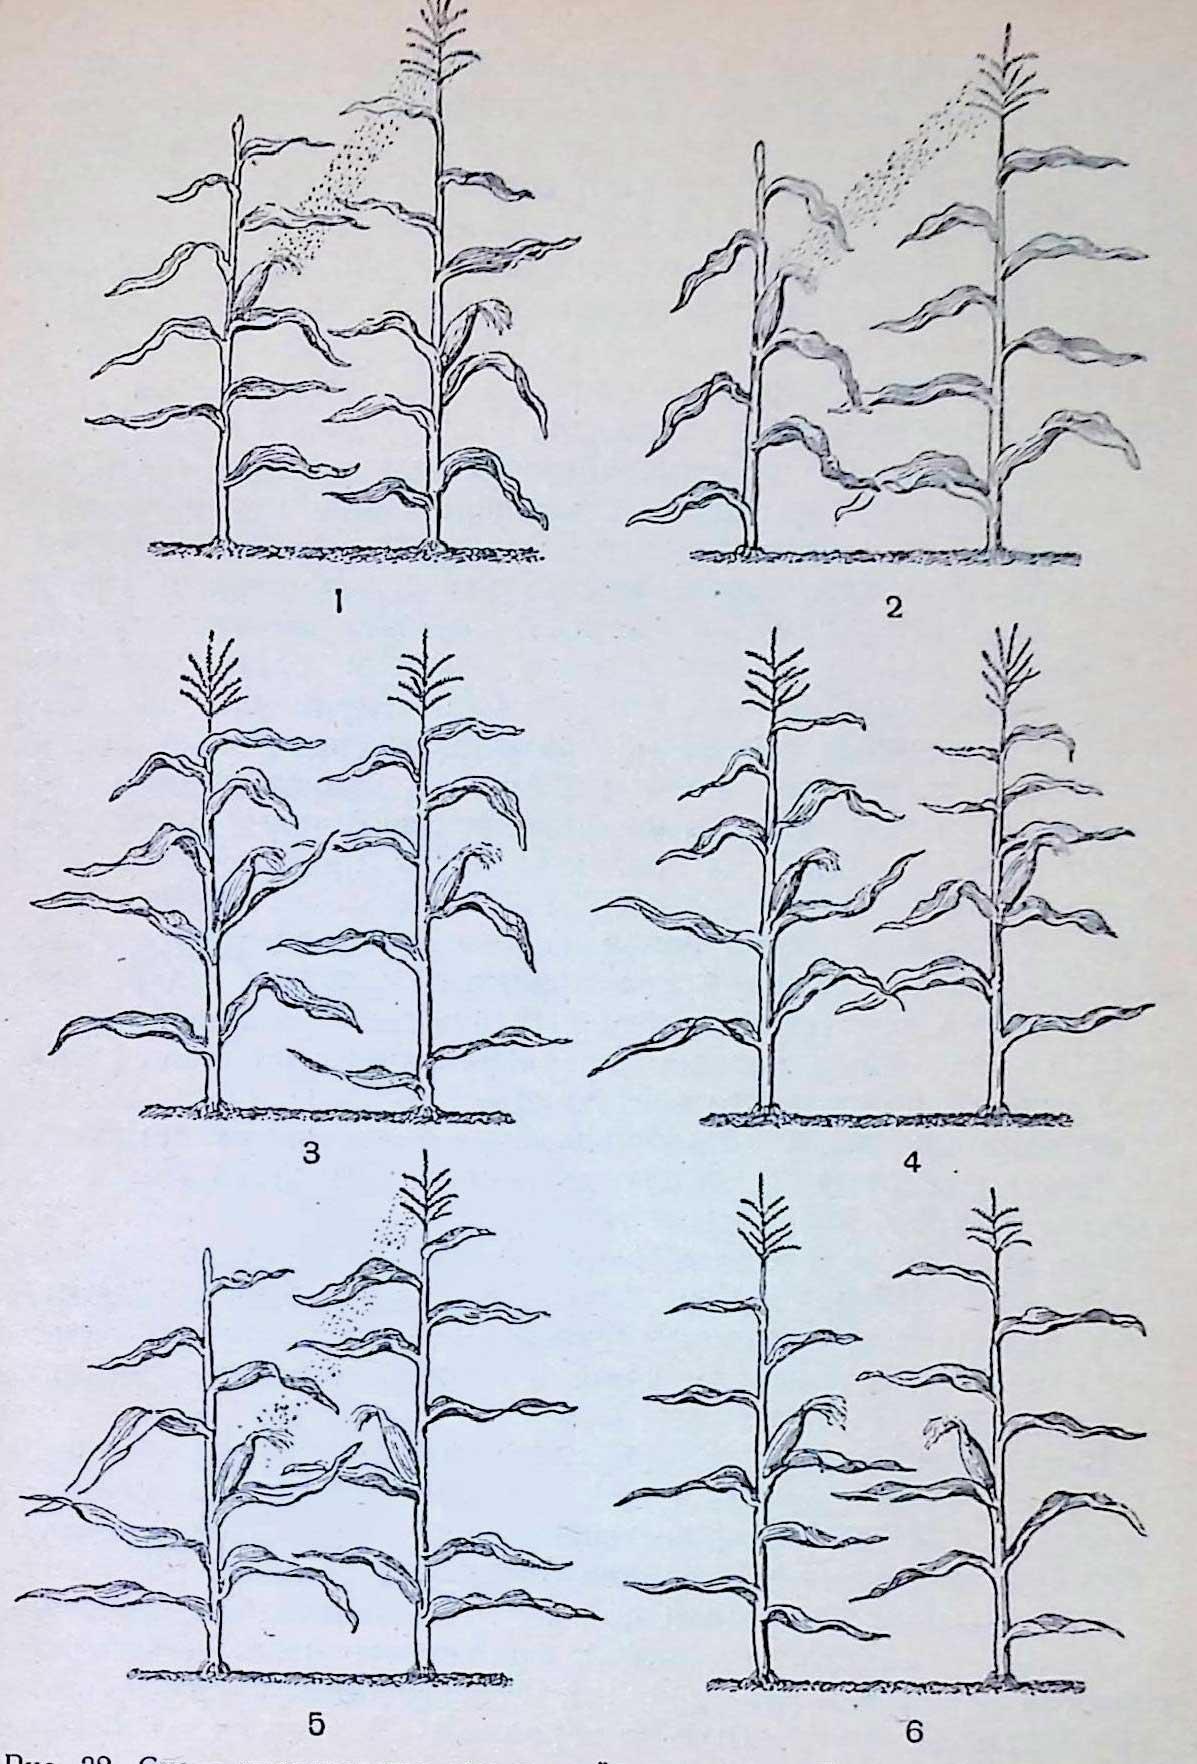 Схема производства семян двойного межлинейного гибрида кукурузы